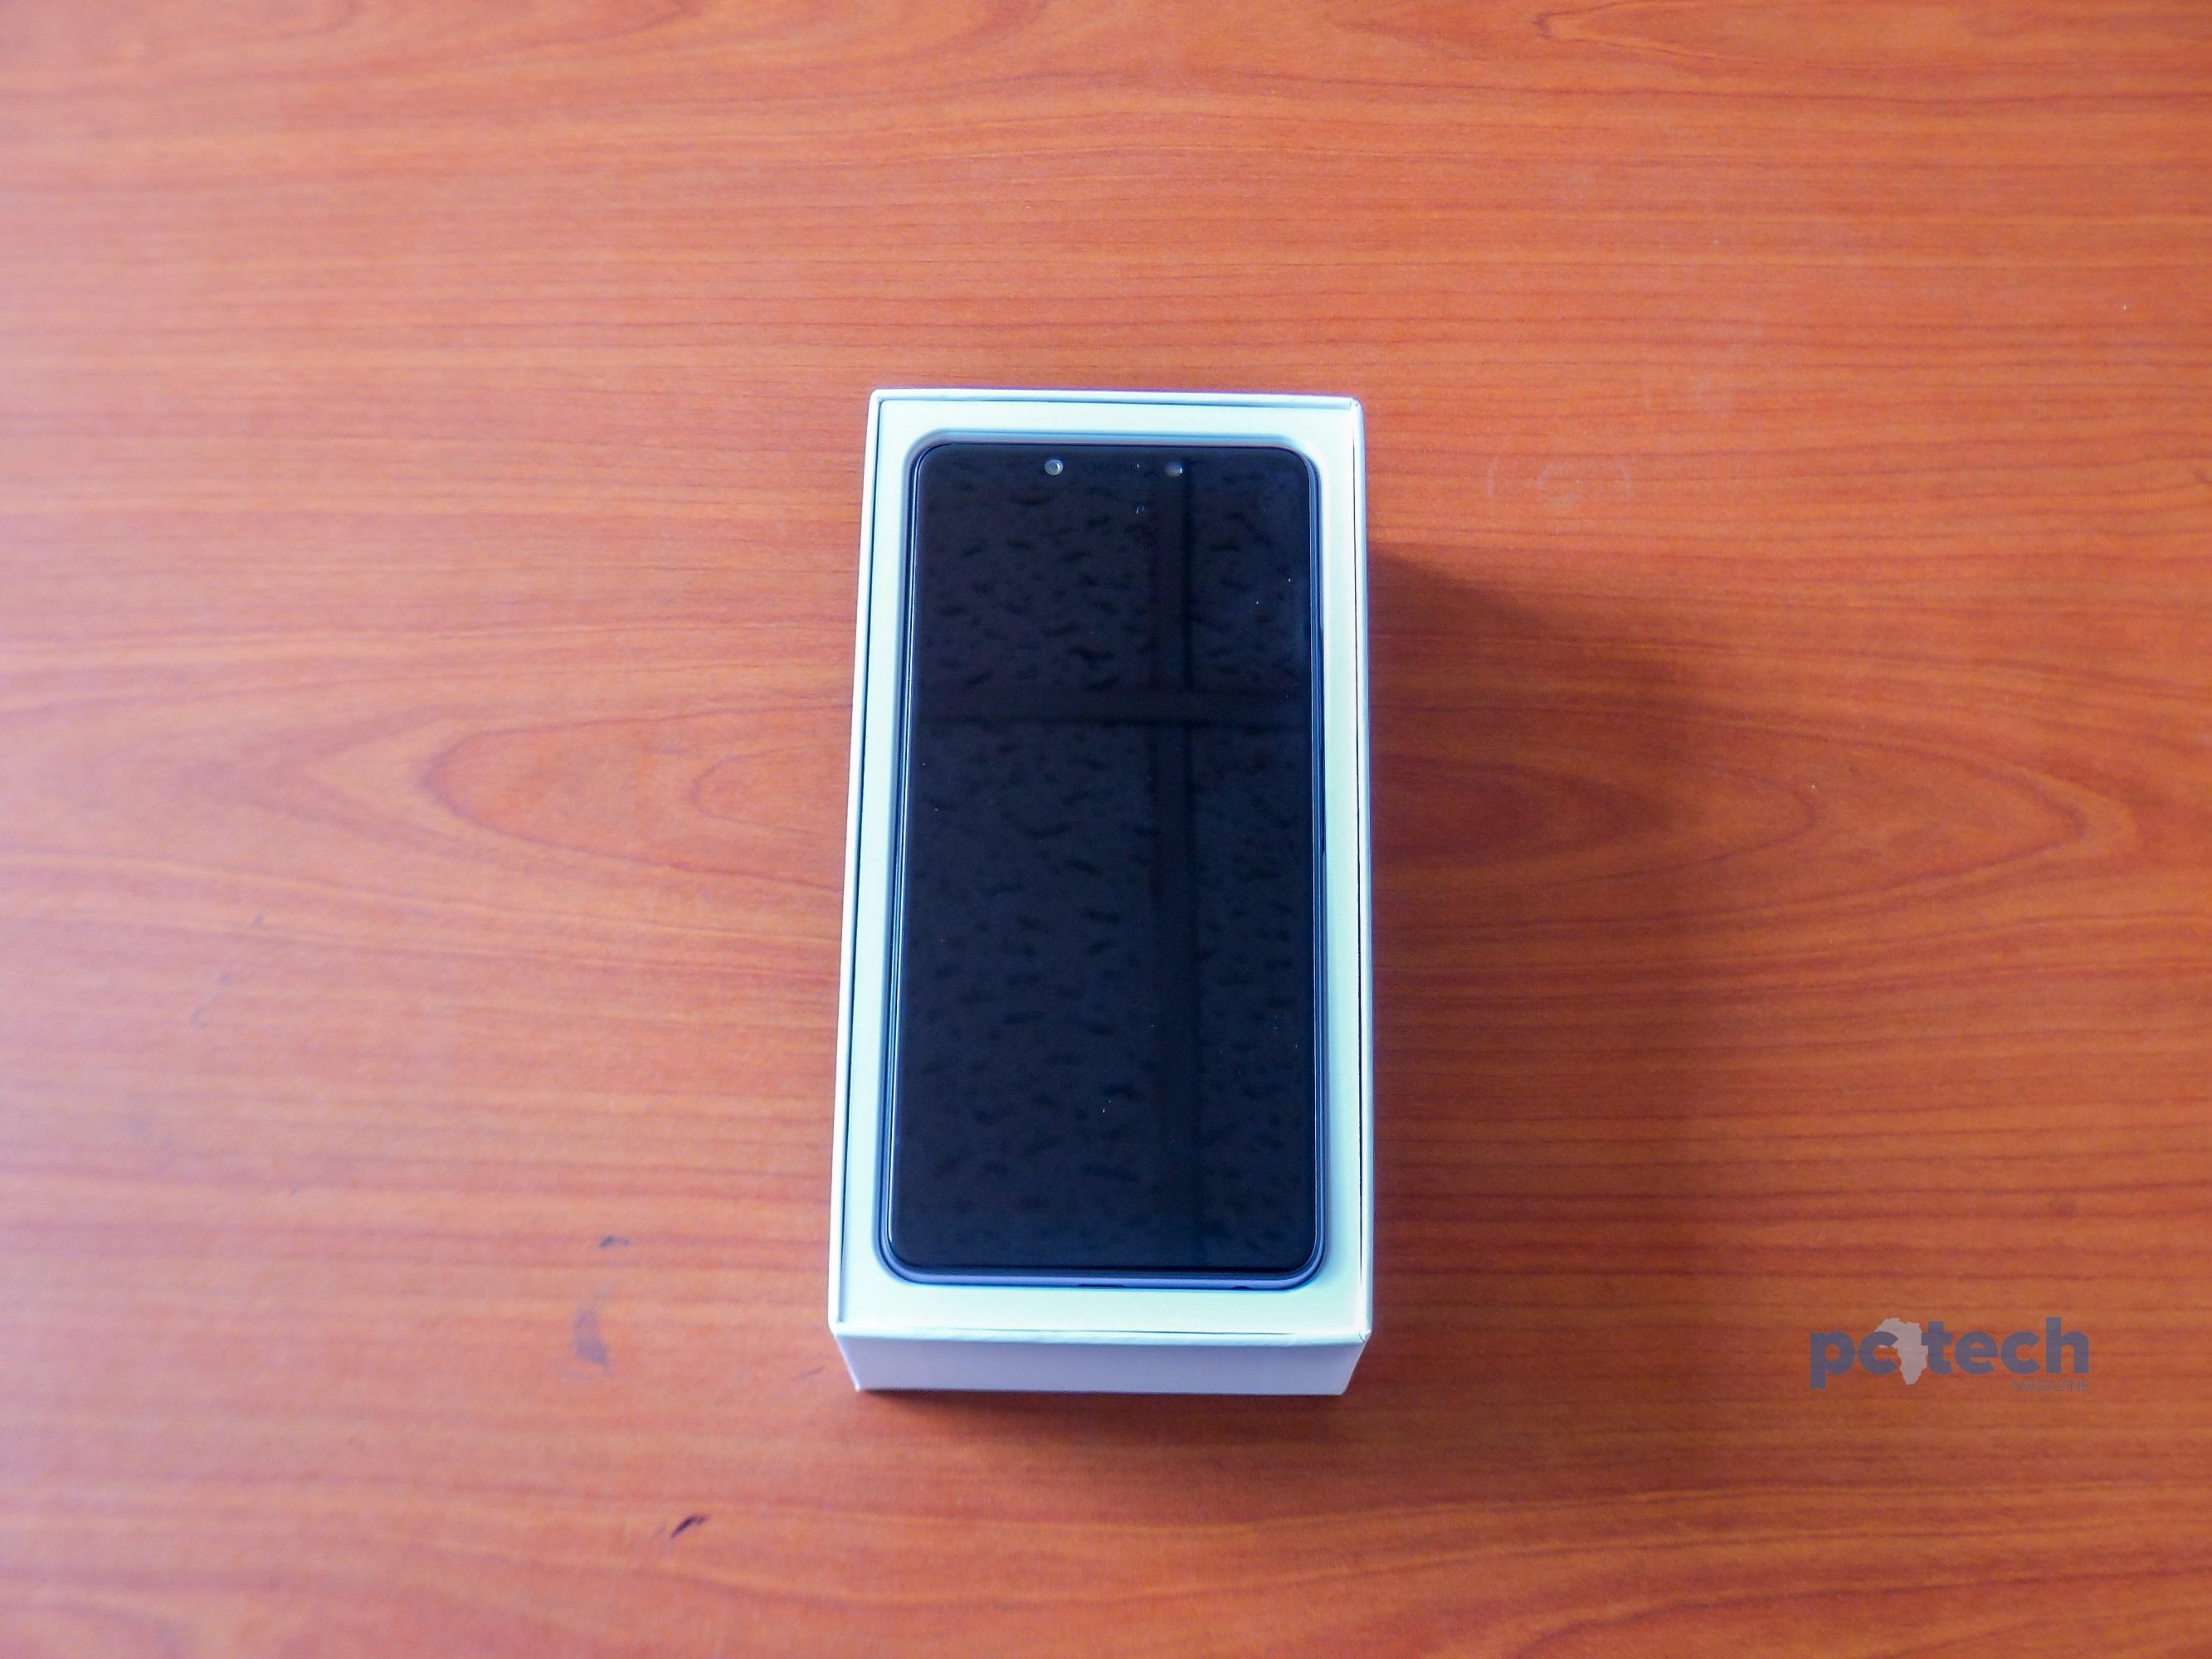 using speaker phone on sharp fo-a660 manual